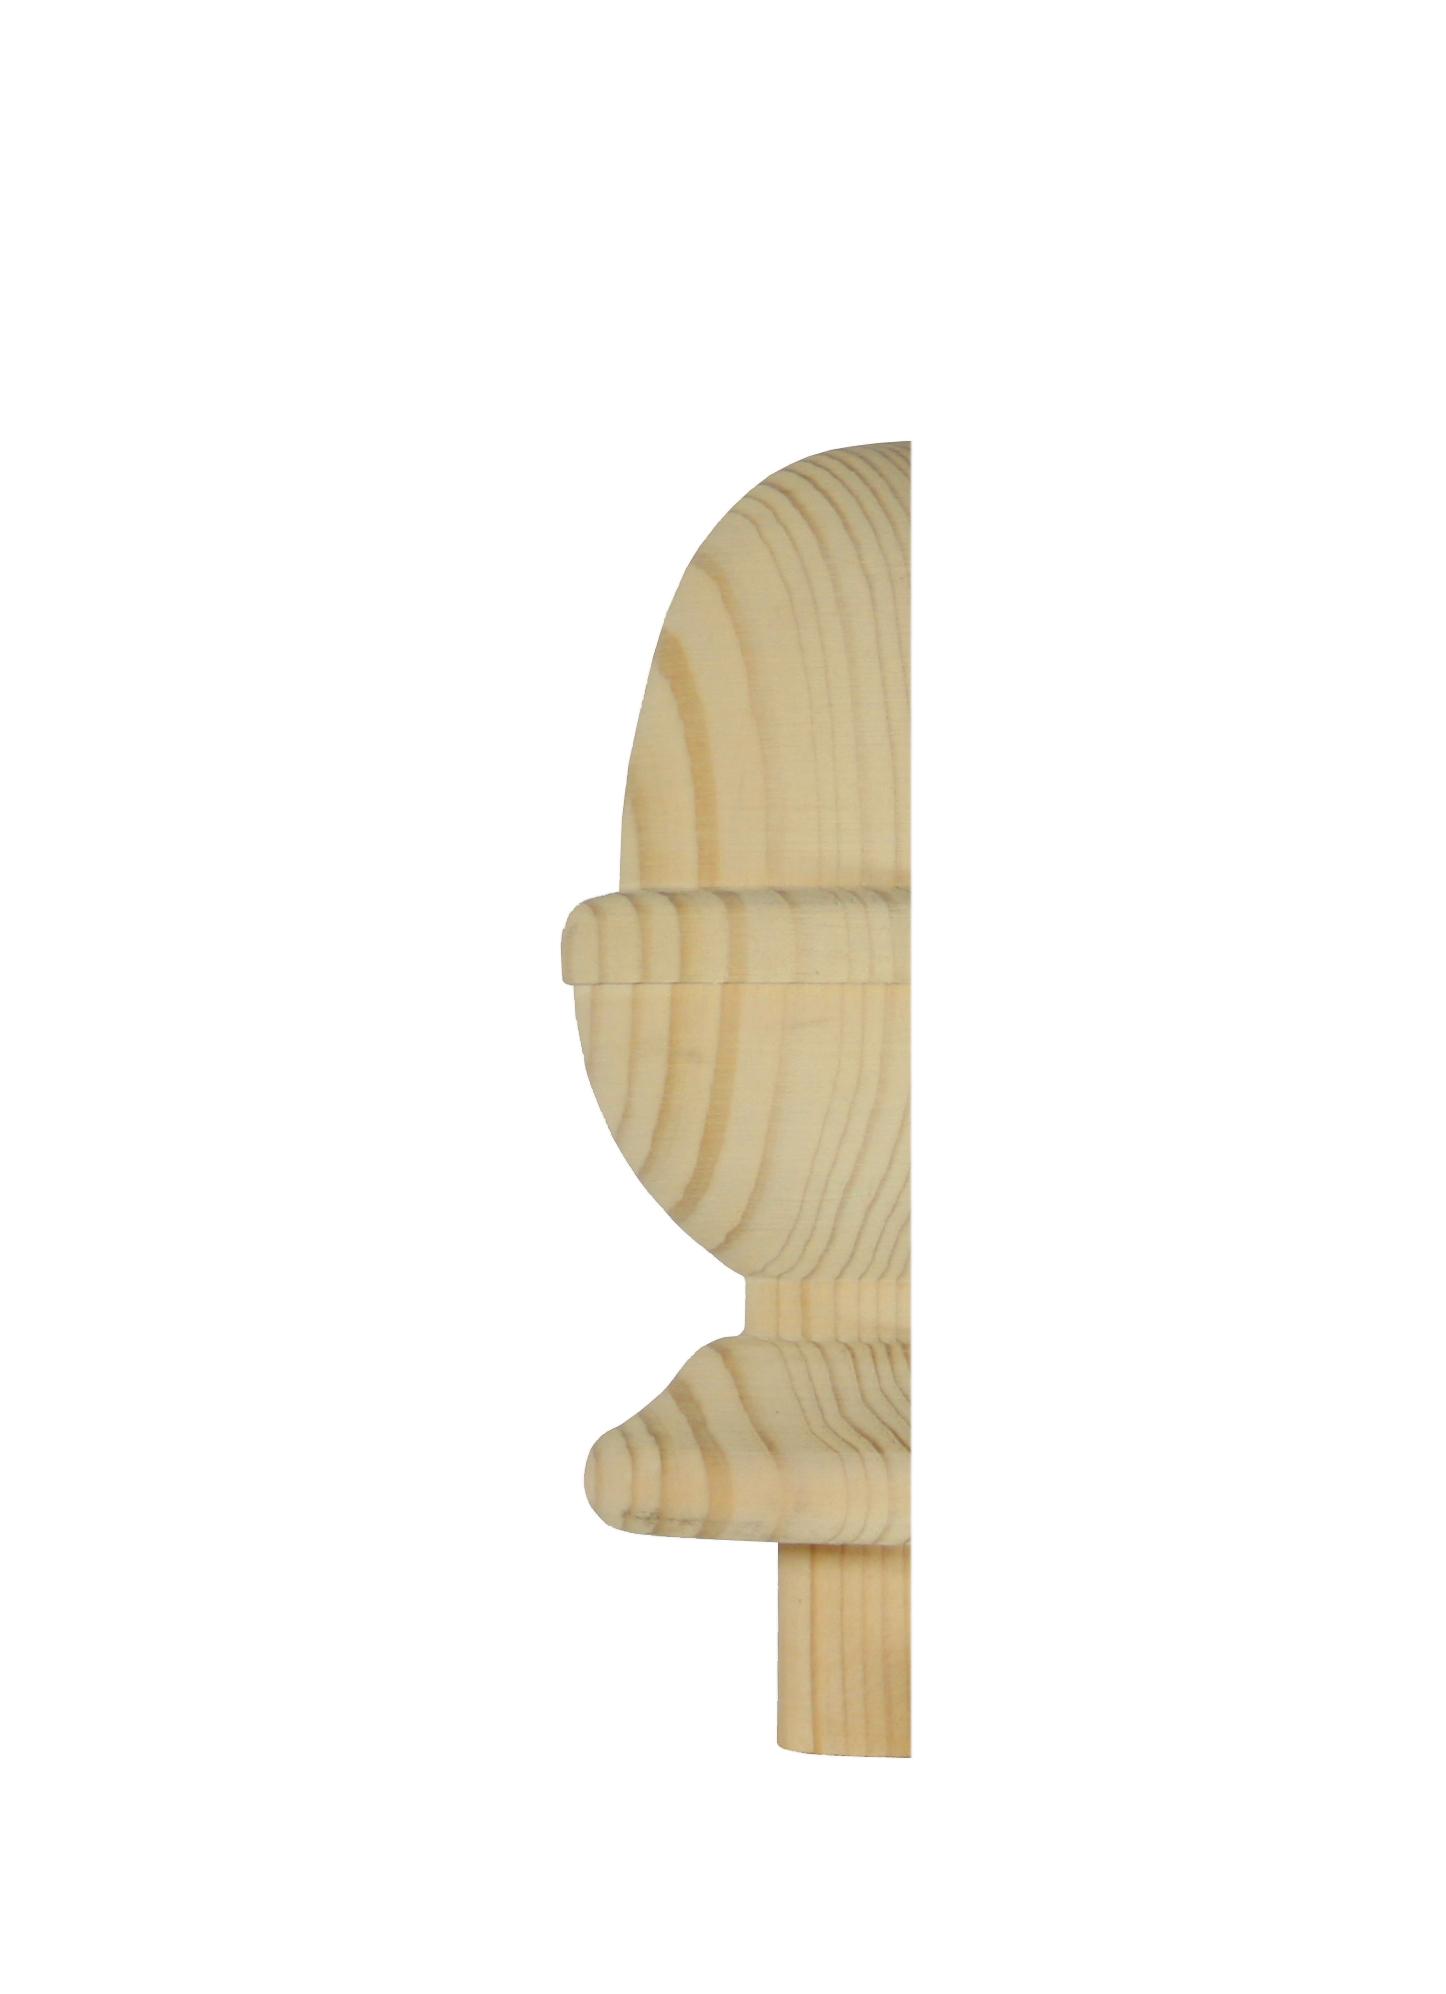 1 Pine Half Acorn Newel Cap 90